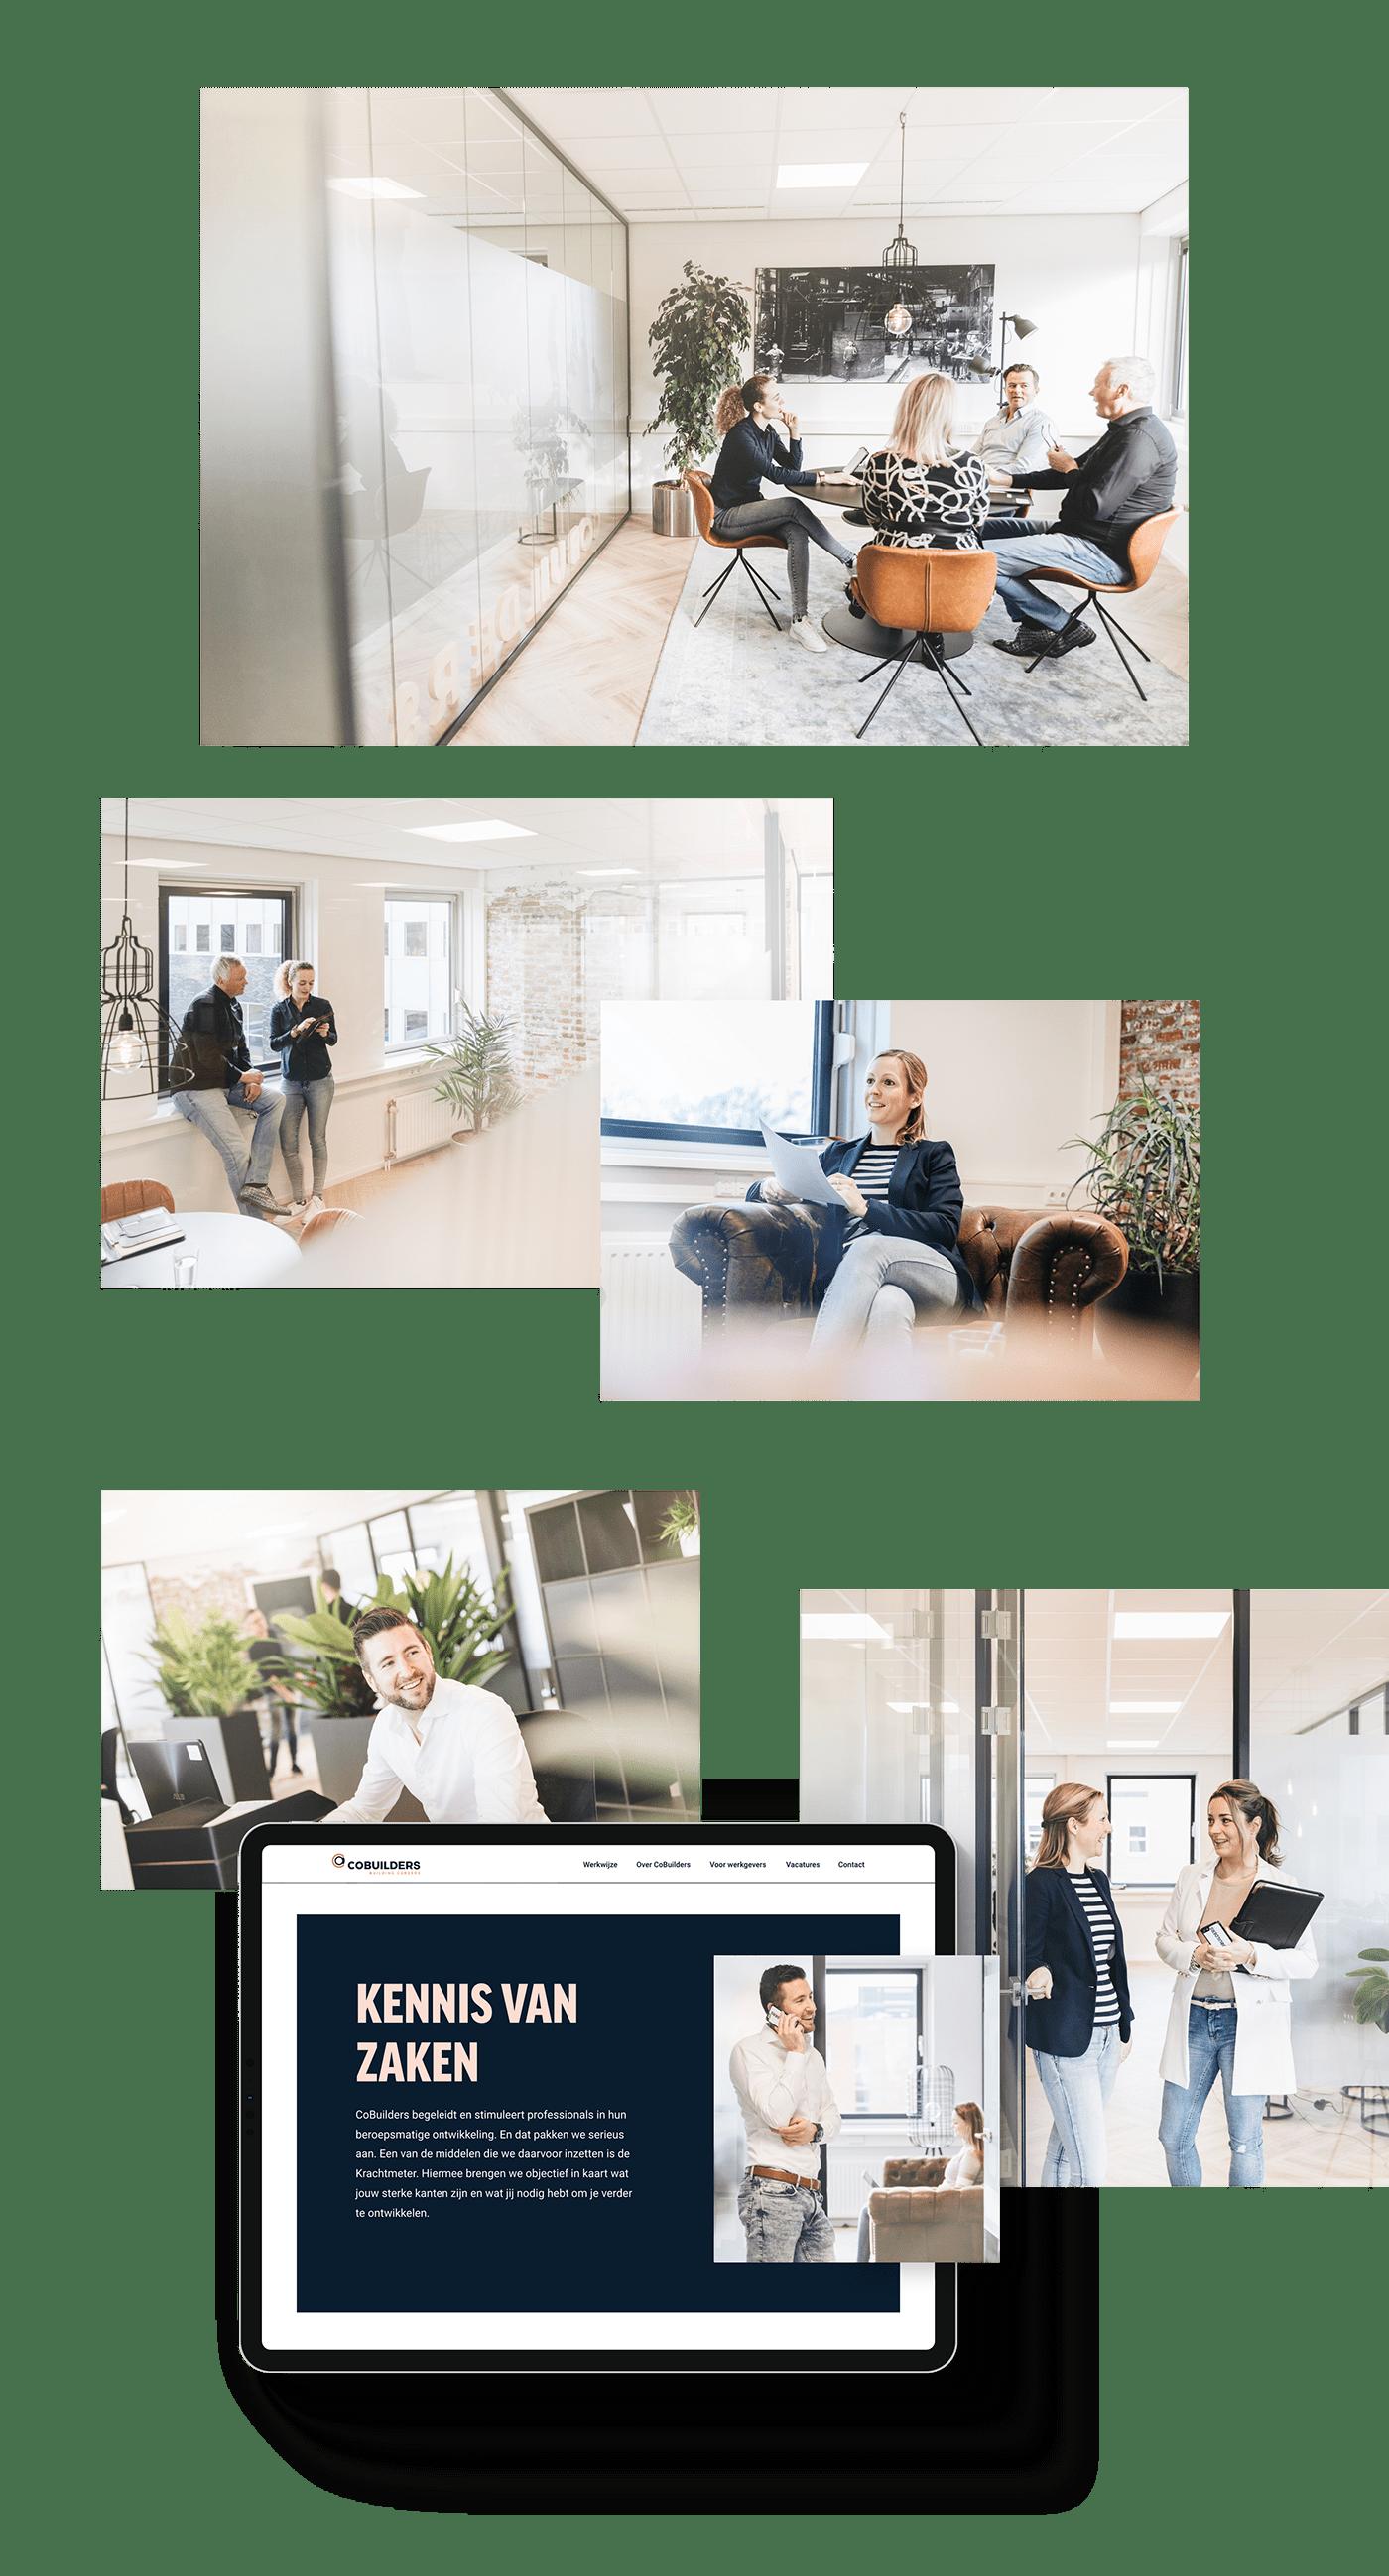 career Engineering  art direction  brand identity copywriting  Corporate Identity Photography  strategy visual identity Webdesign